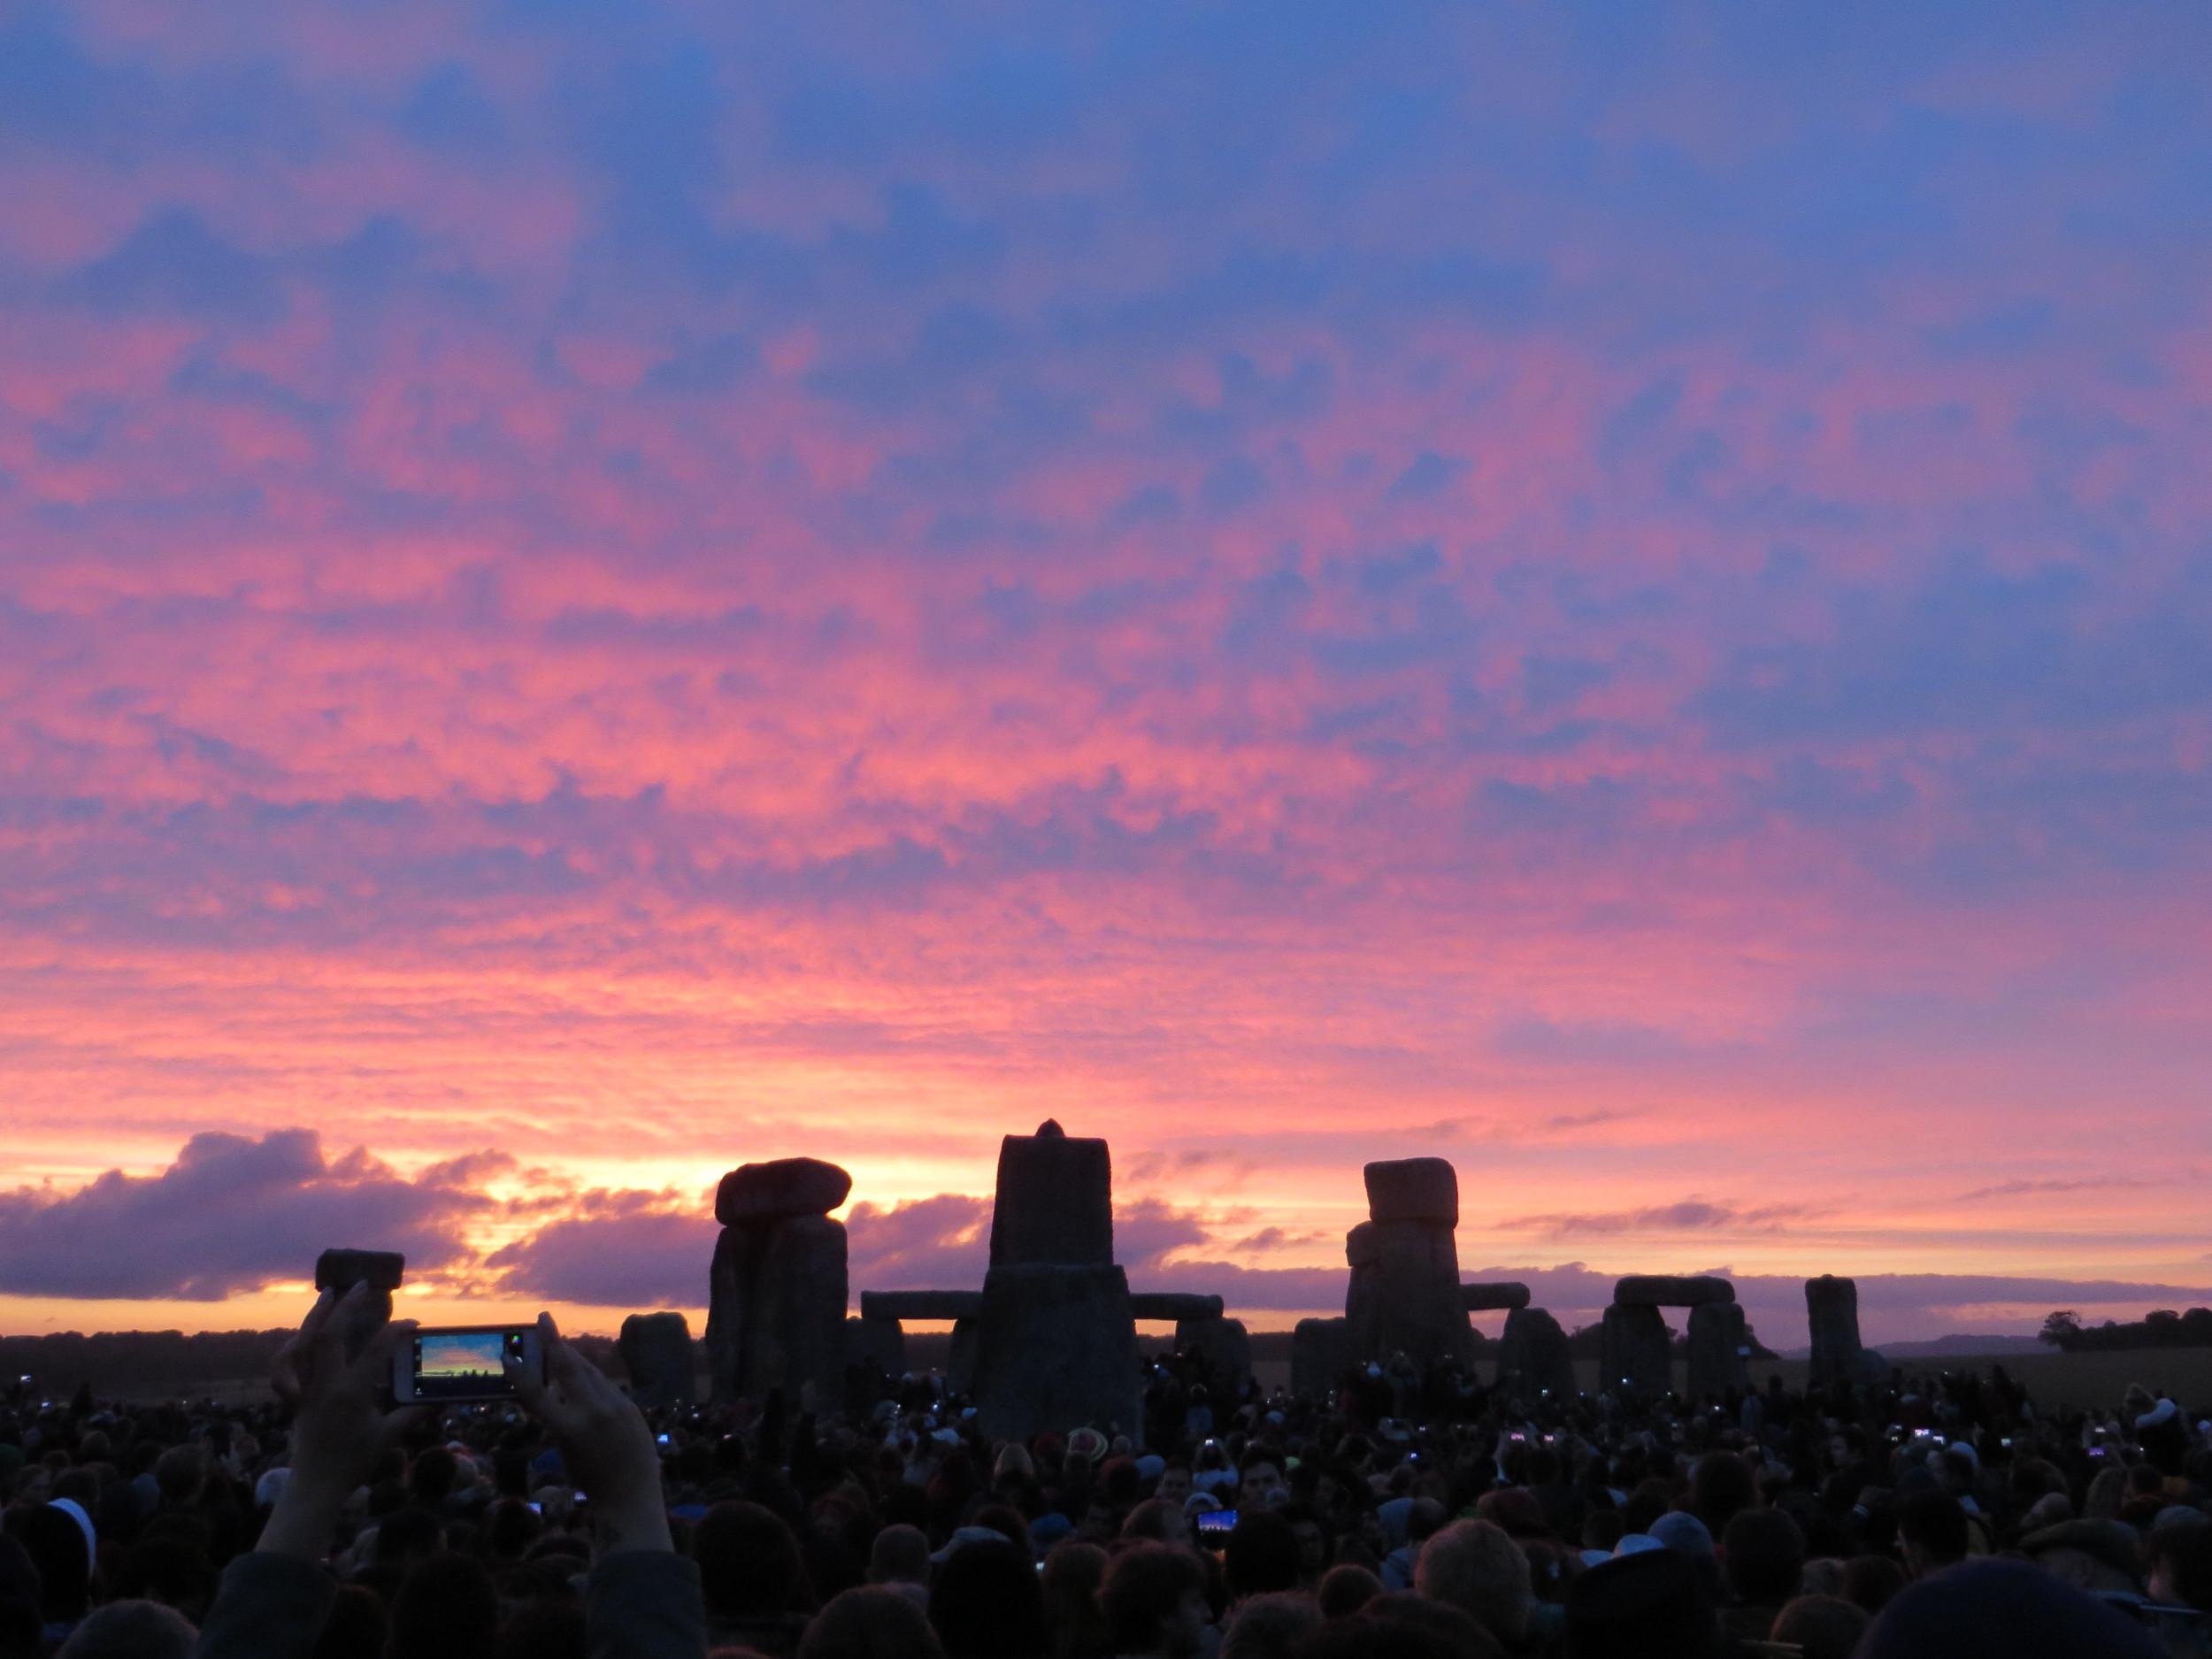 Sunrise at Stonhenge 21 June 2015